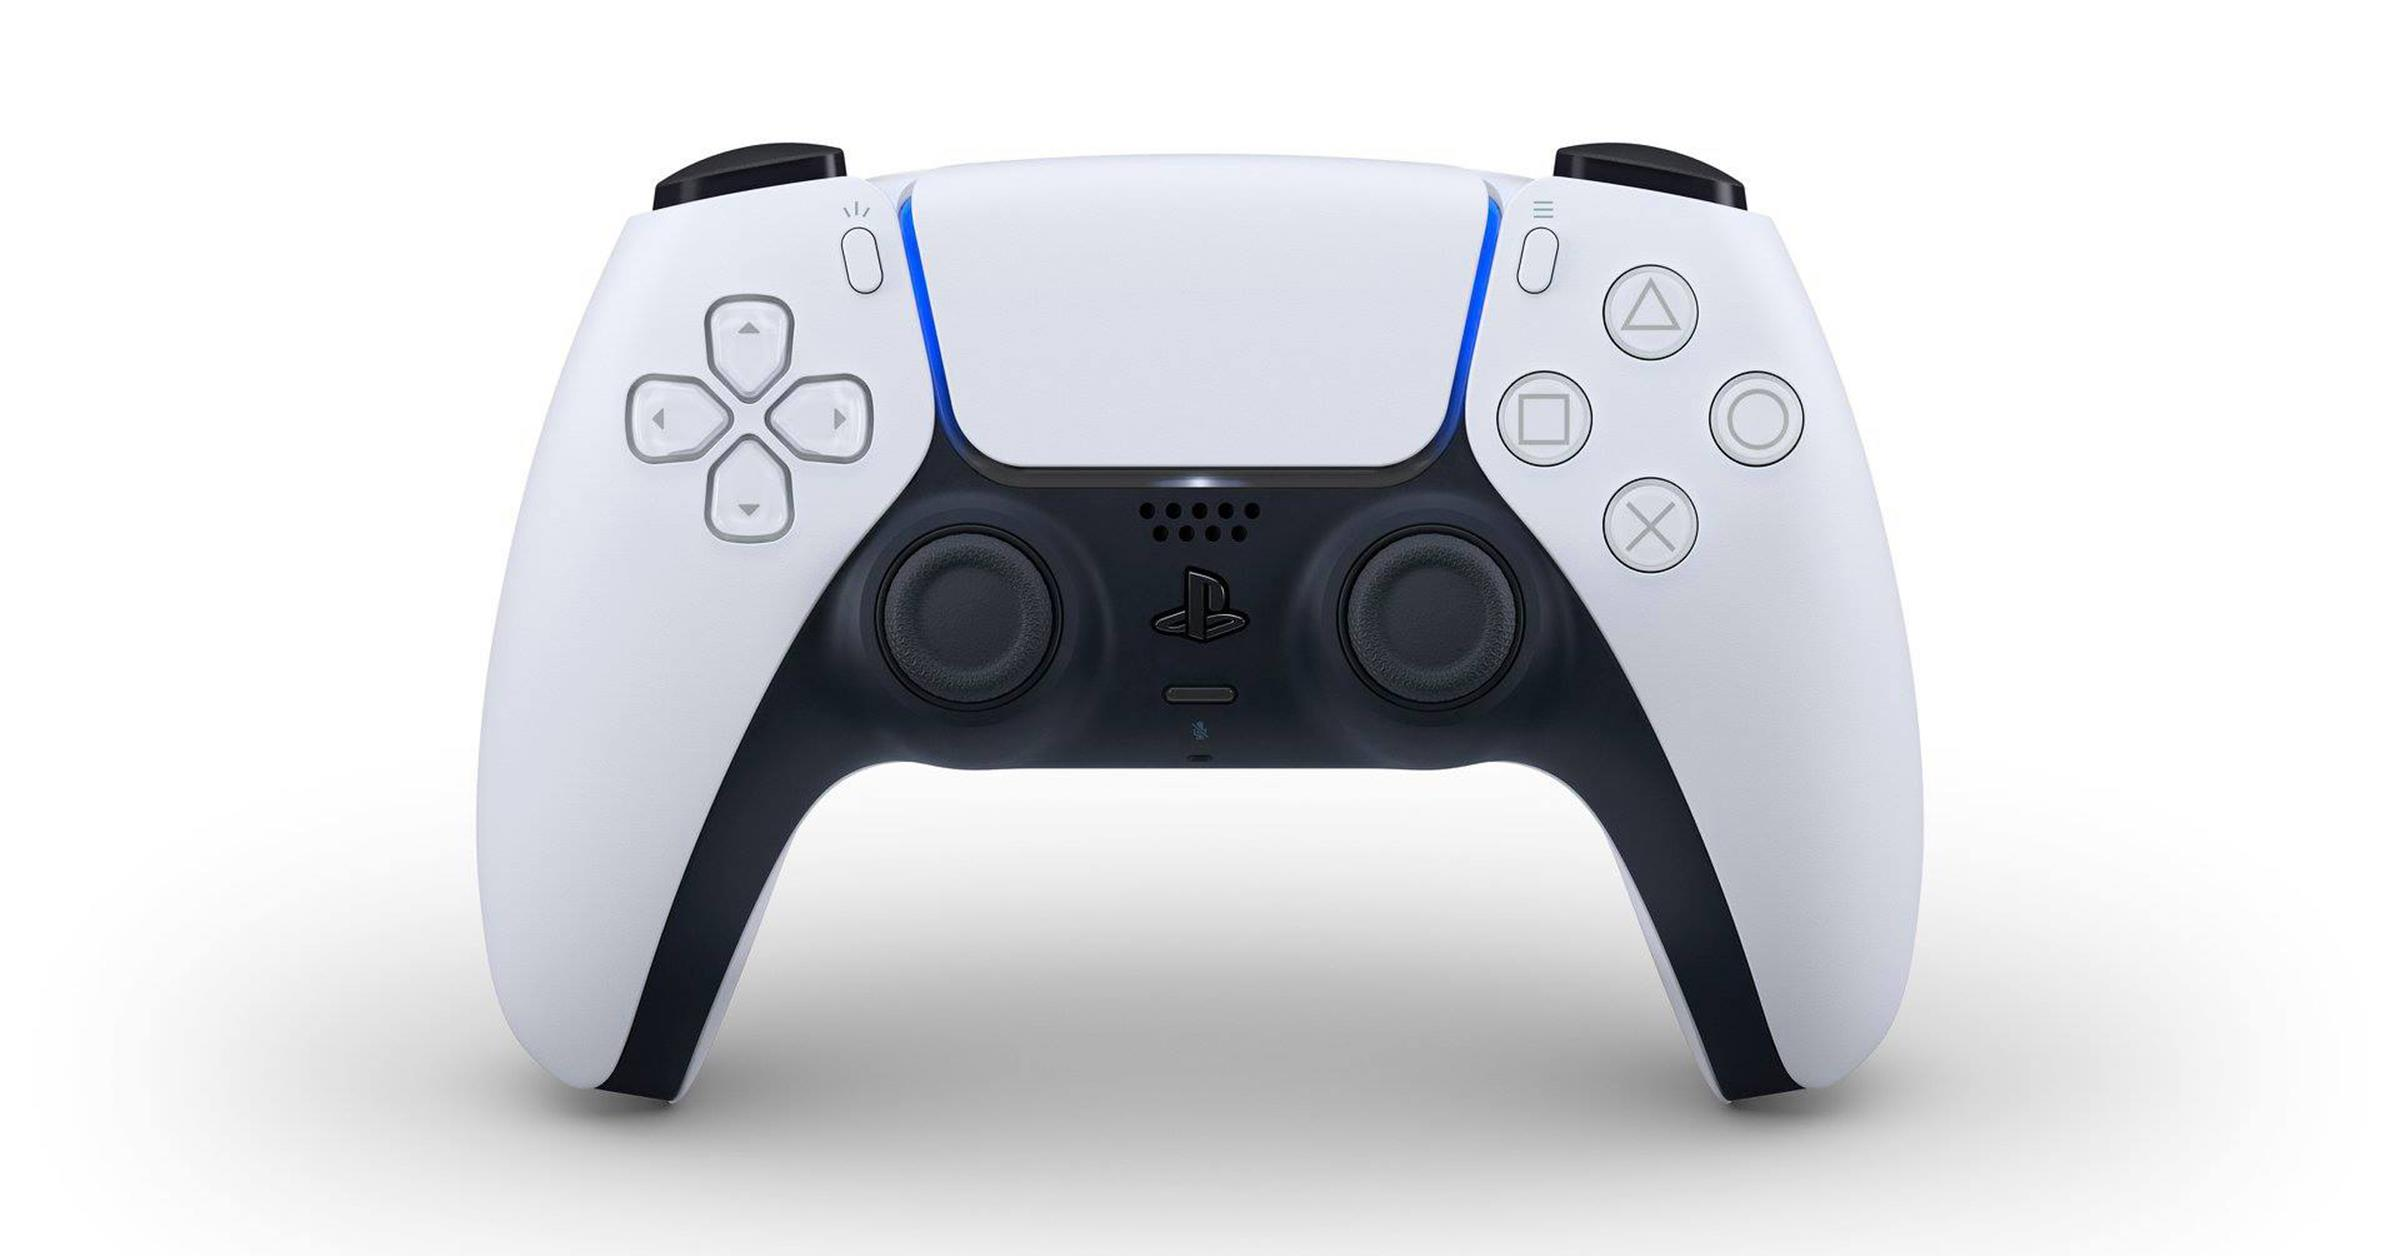 PlayStation 5 / PS5 控制器 DualSense 外型亮相,改用 USB-C 傳輸埠並導入觸覺反饋等技術